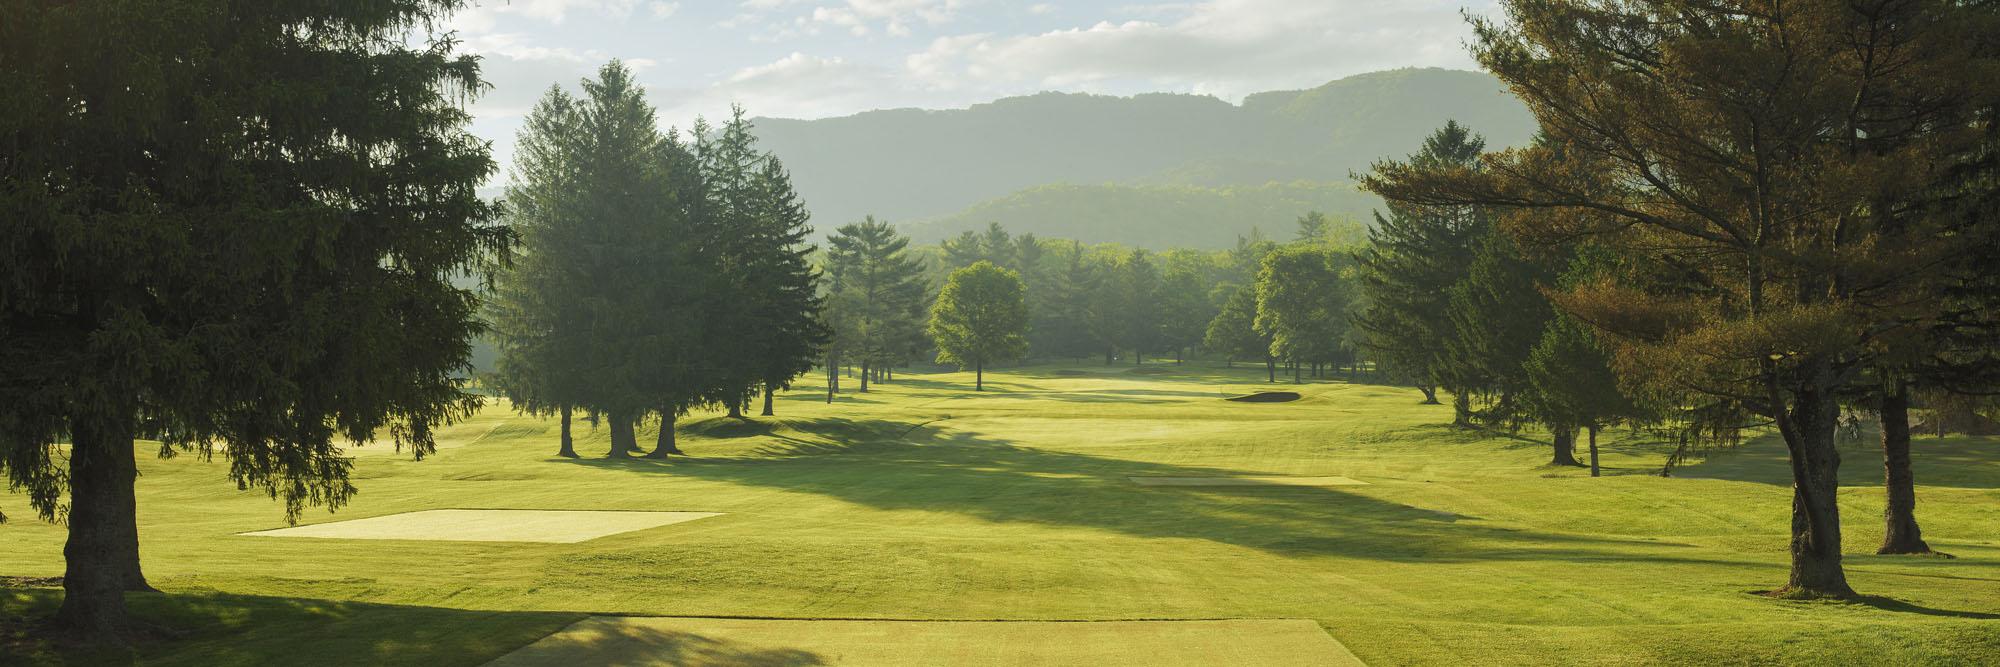 Golf Course Image - The Greenbrier Meadows Course No. 8